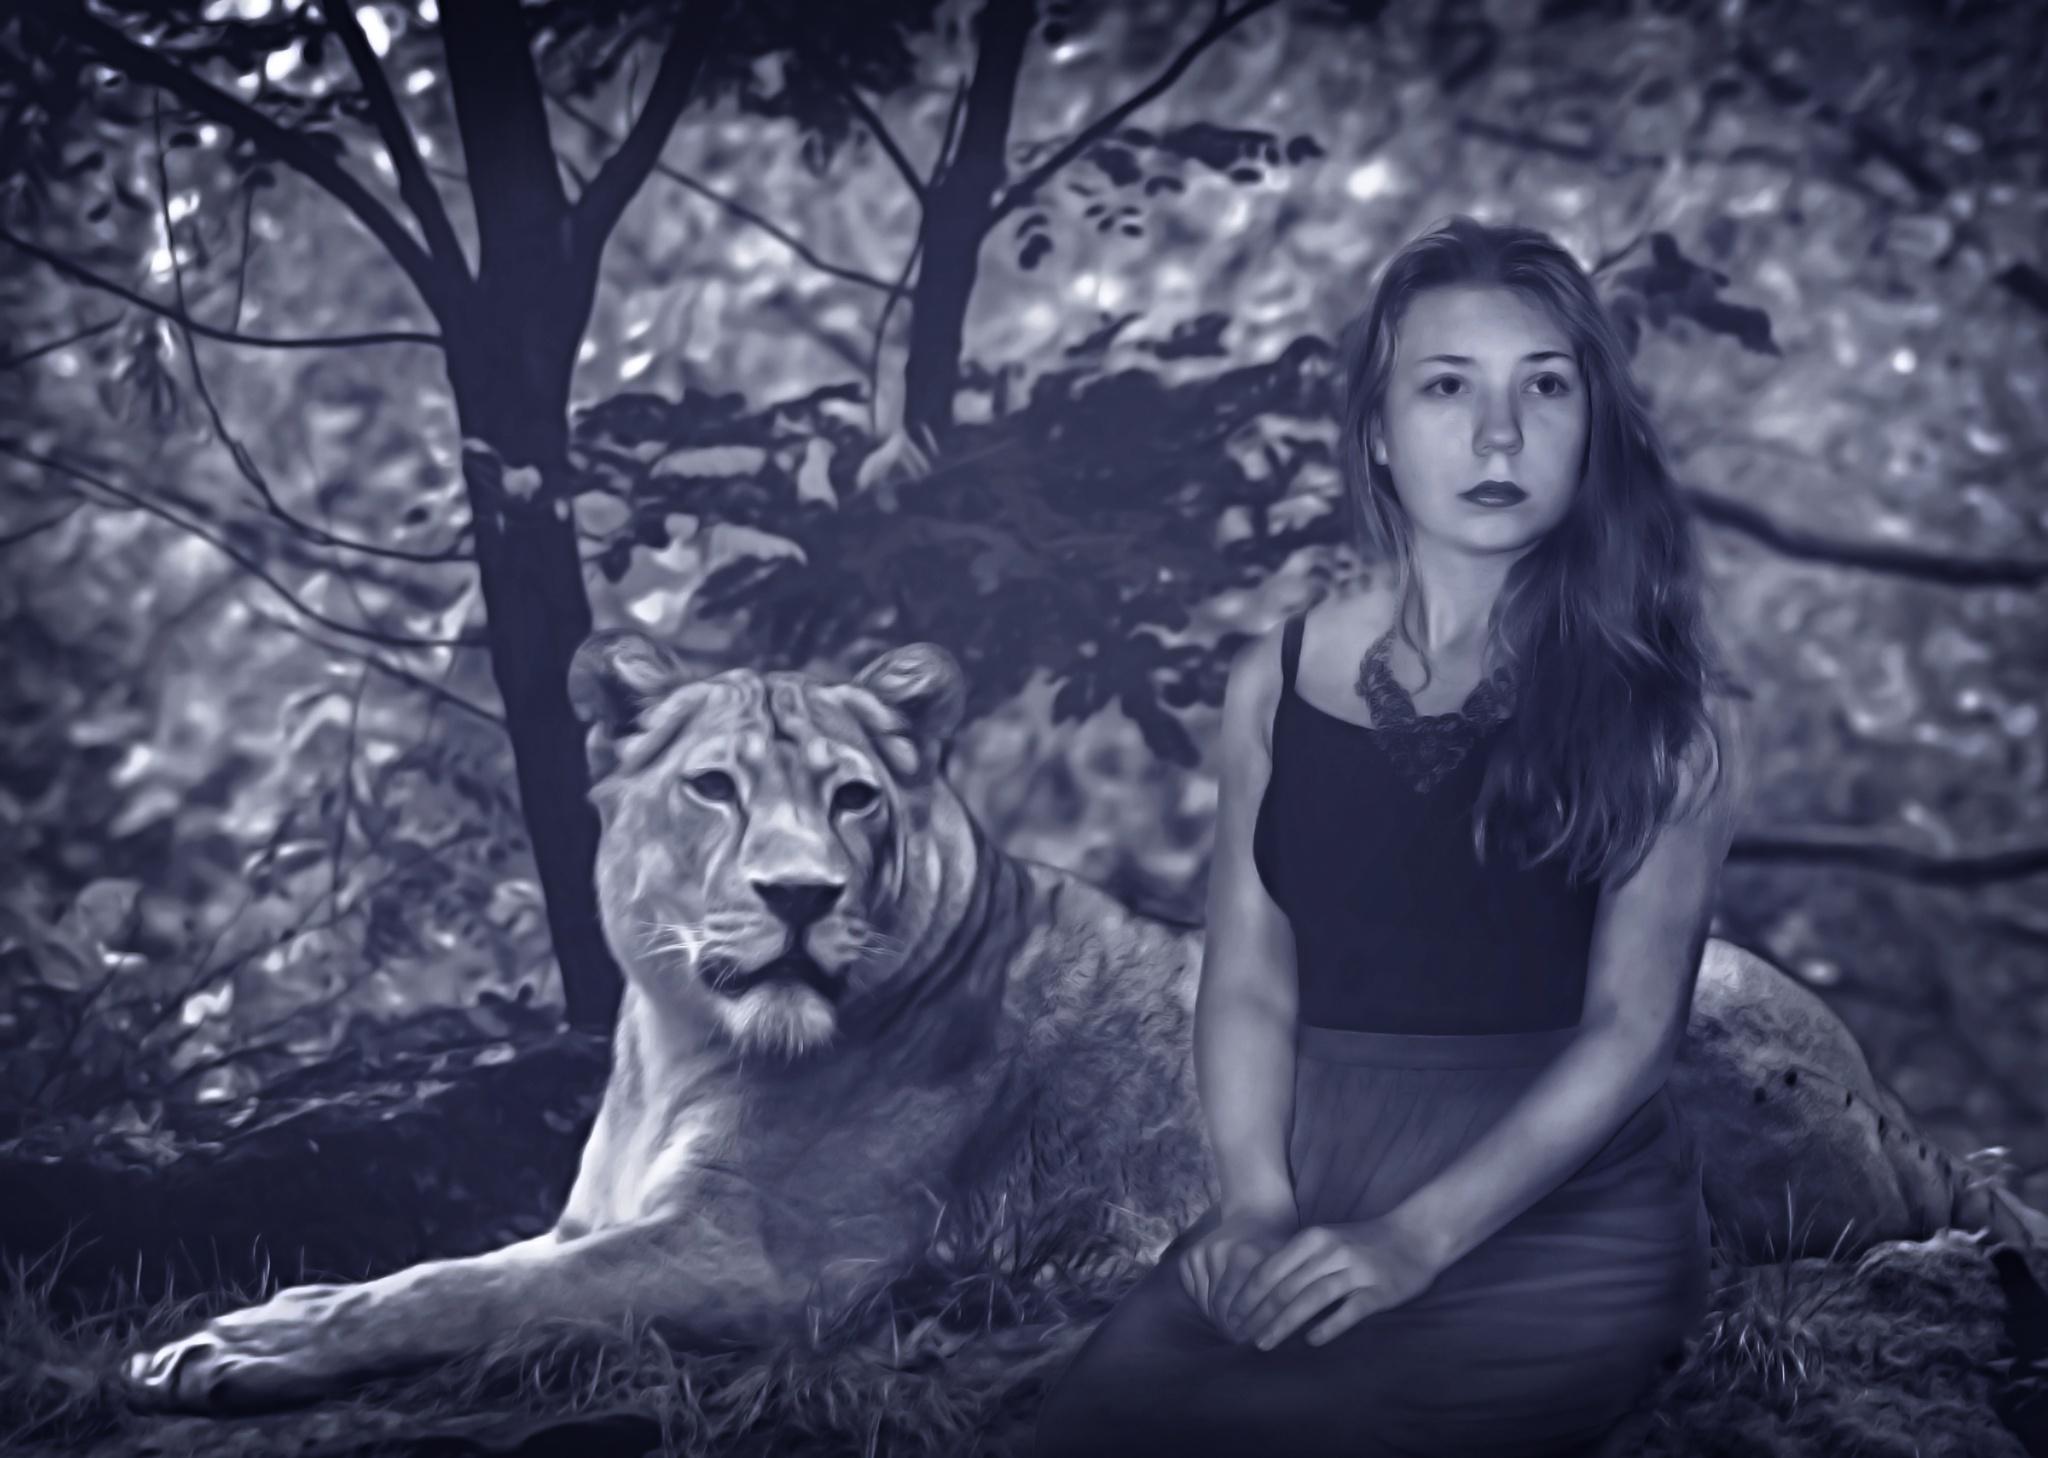 Löwenmädchen by jennilucht